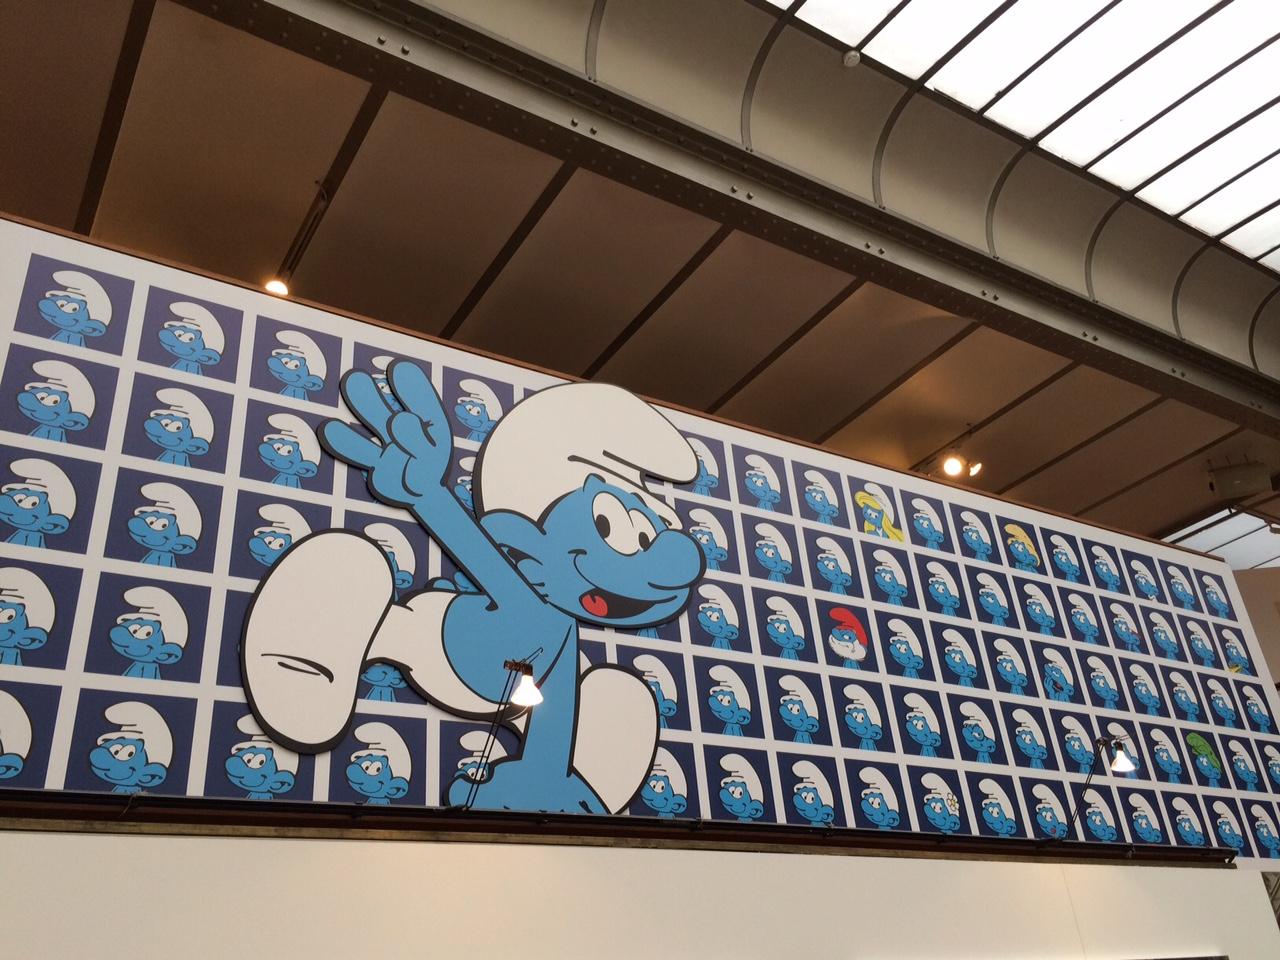 bruxelles_musée_de_la_BD_fev_2016_schtroumpf (5)